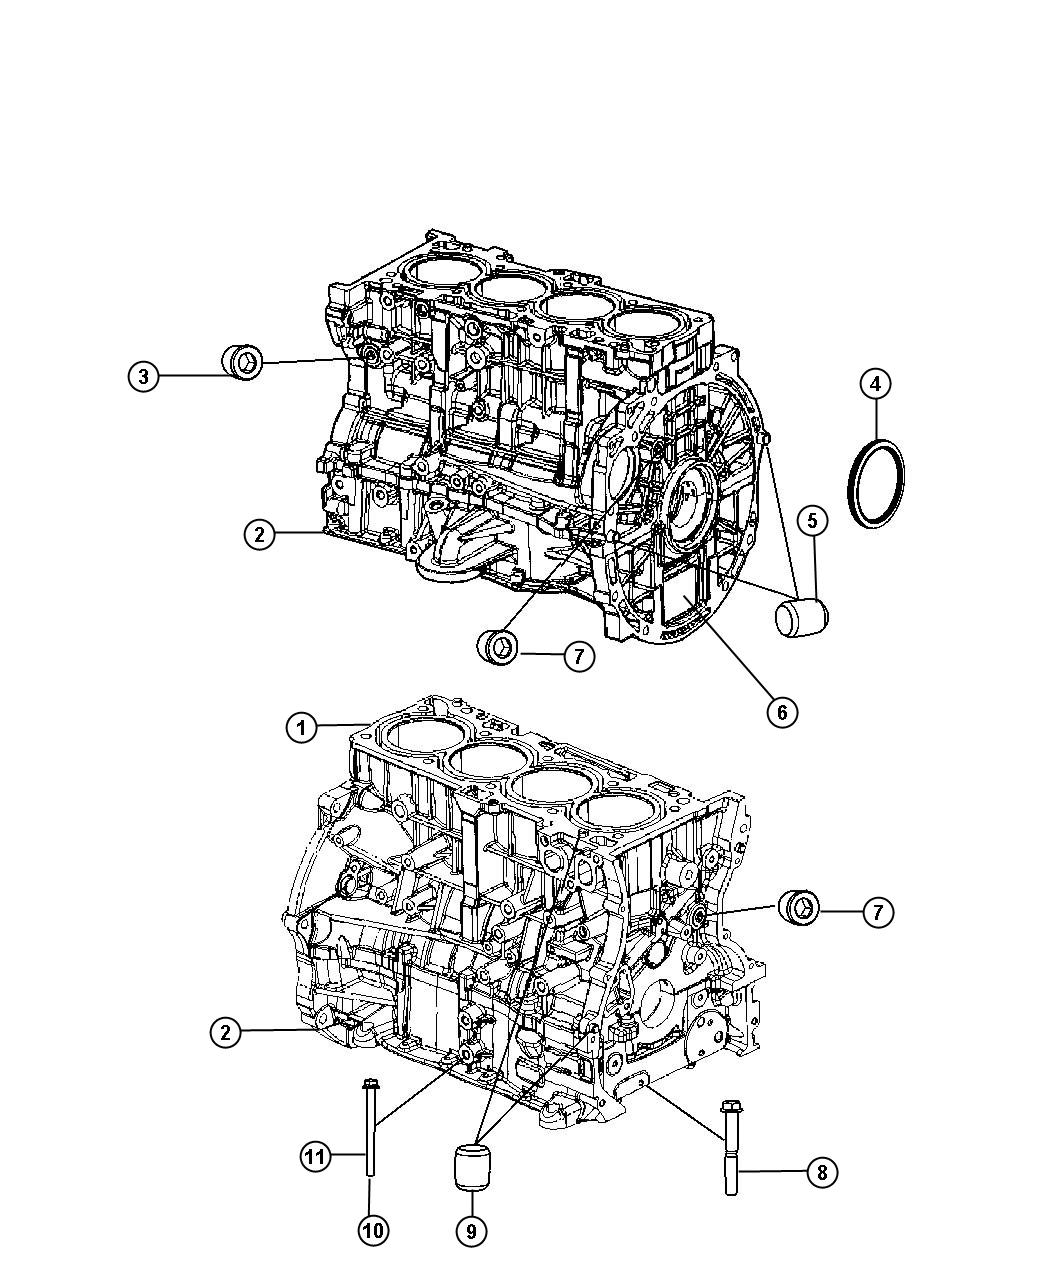 2010 Dodge Journey Engine Parts Diagram, 2010, Free Engine